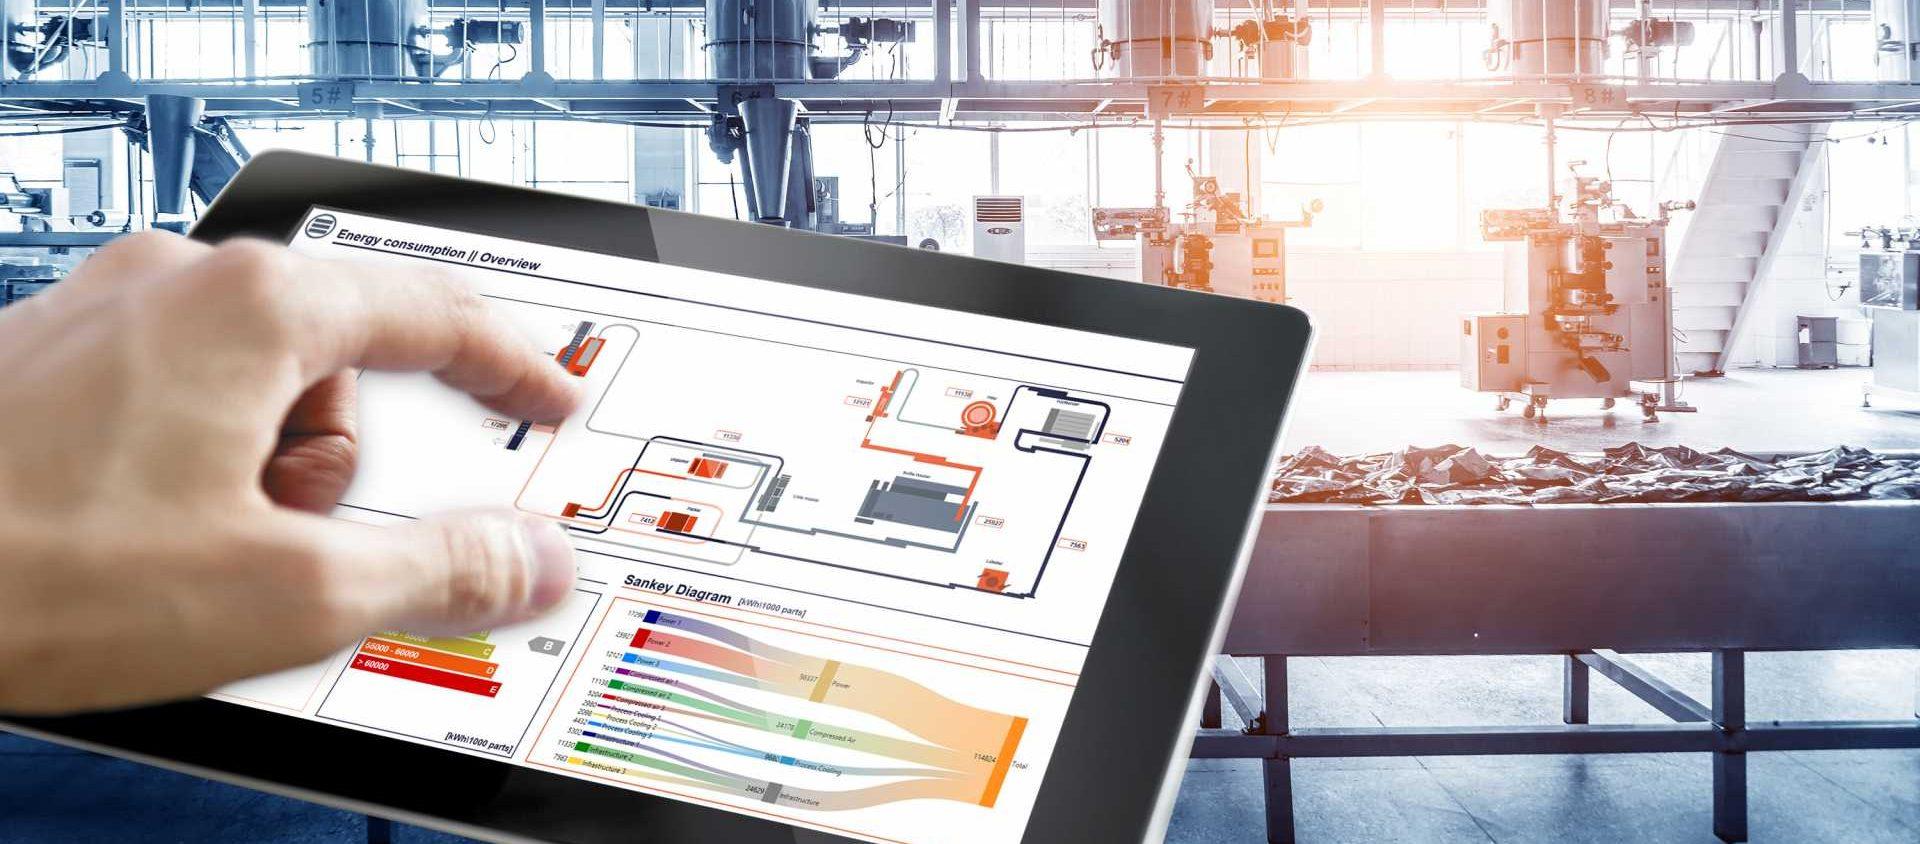 An ergonomic transition to Smart manufacturing - Intelligent Enterprise